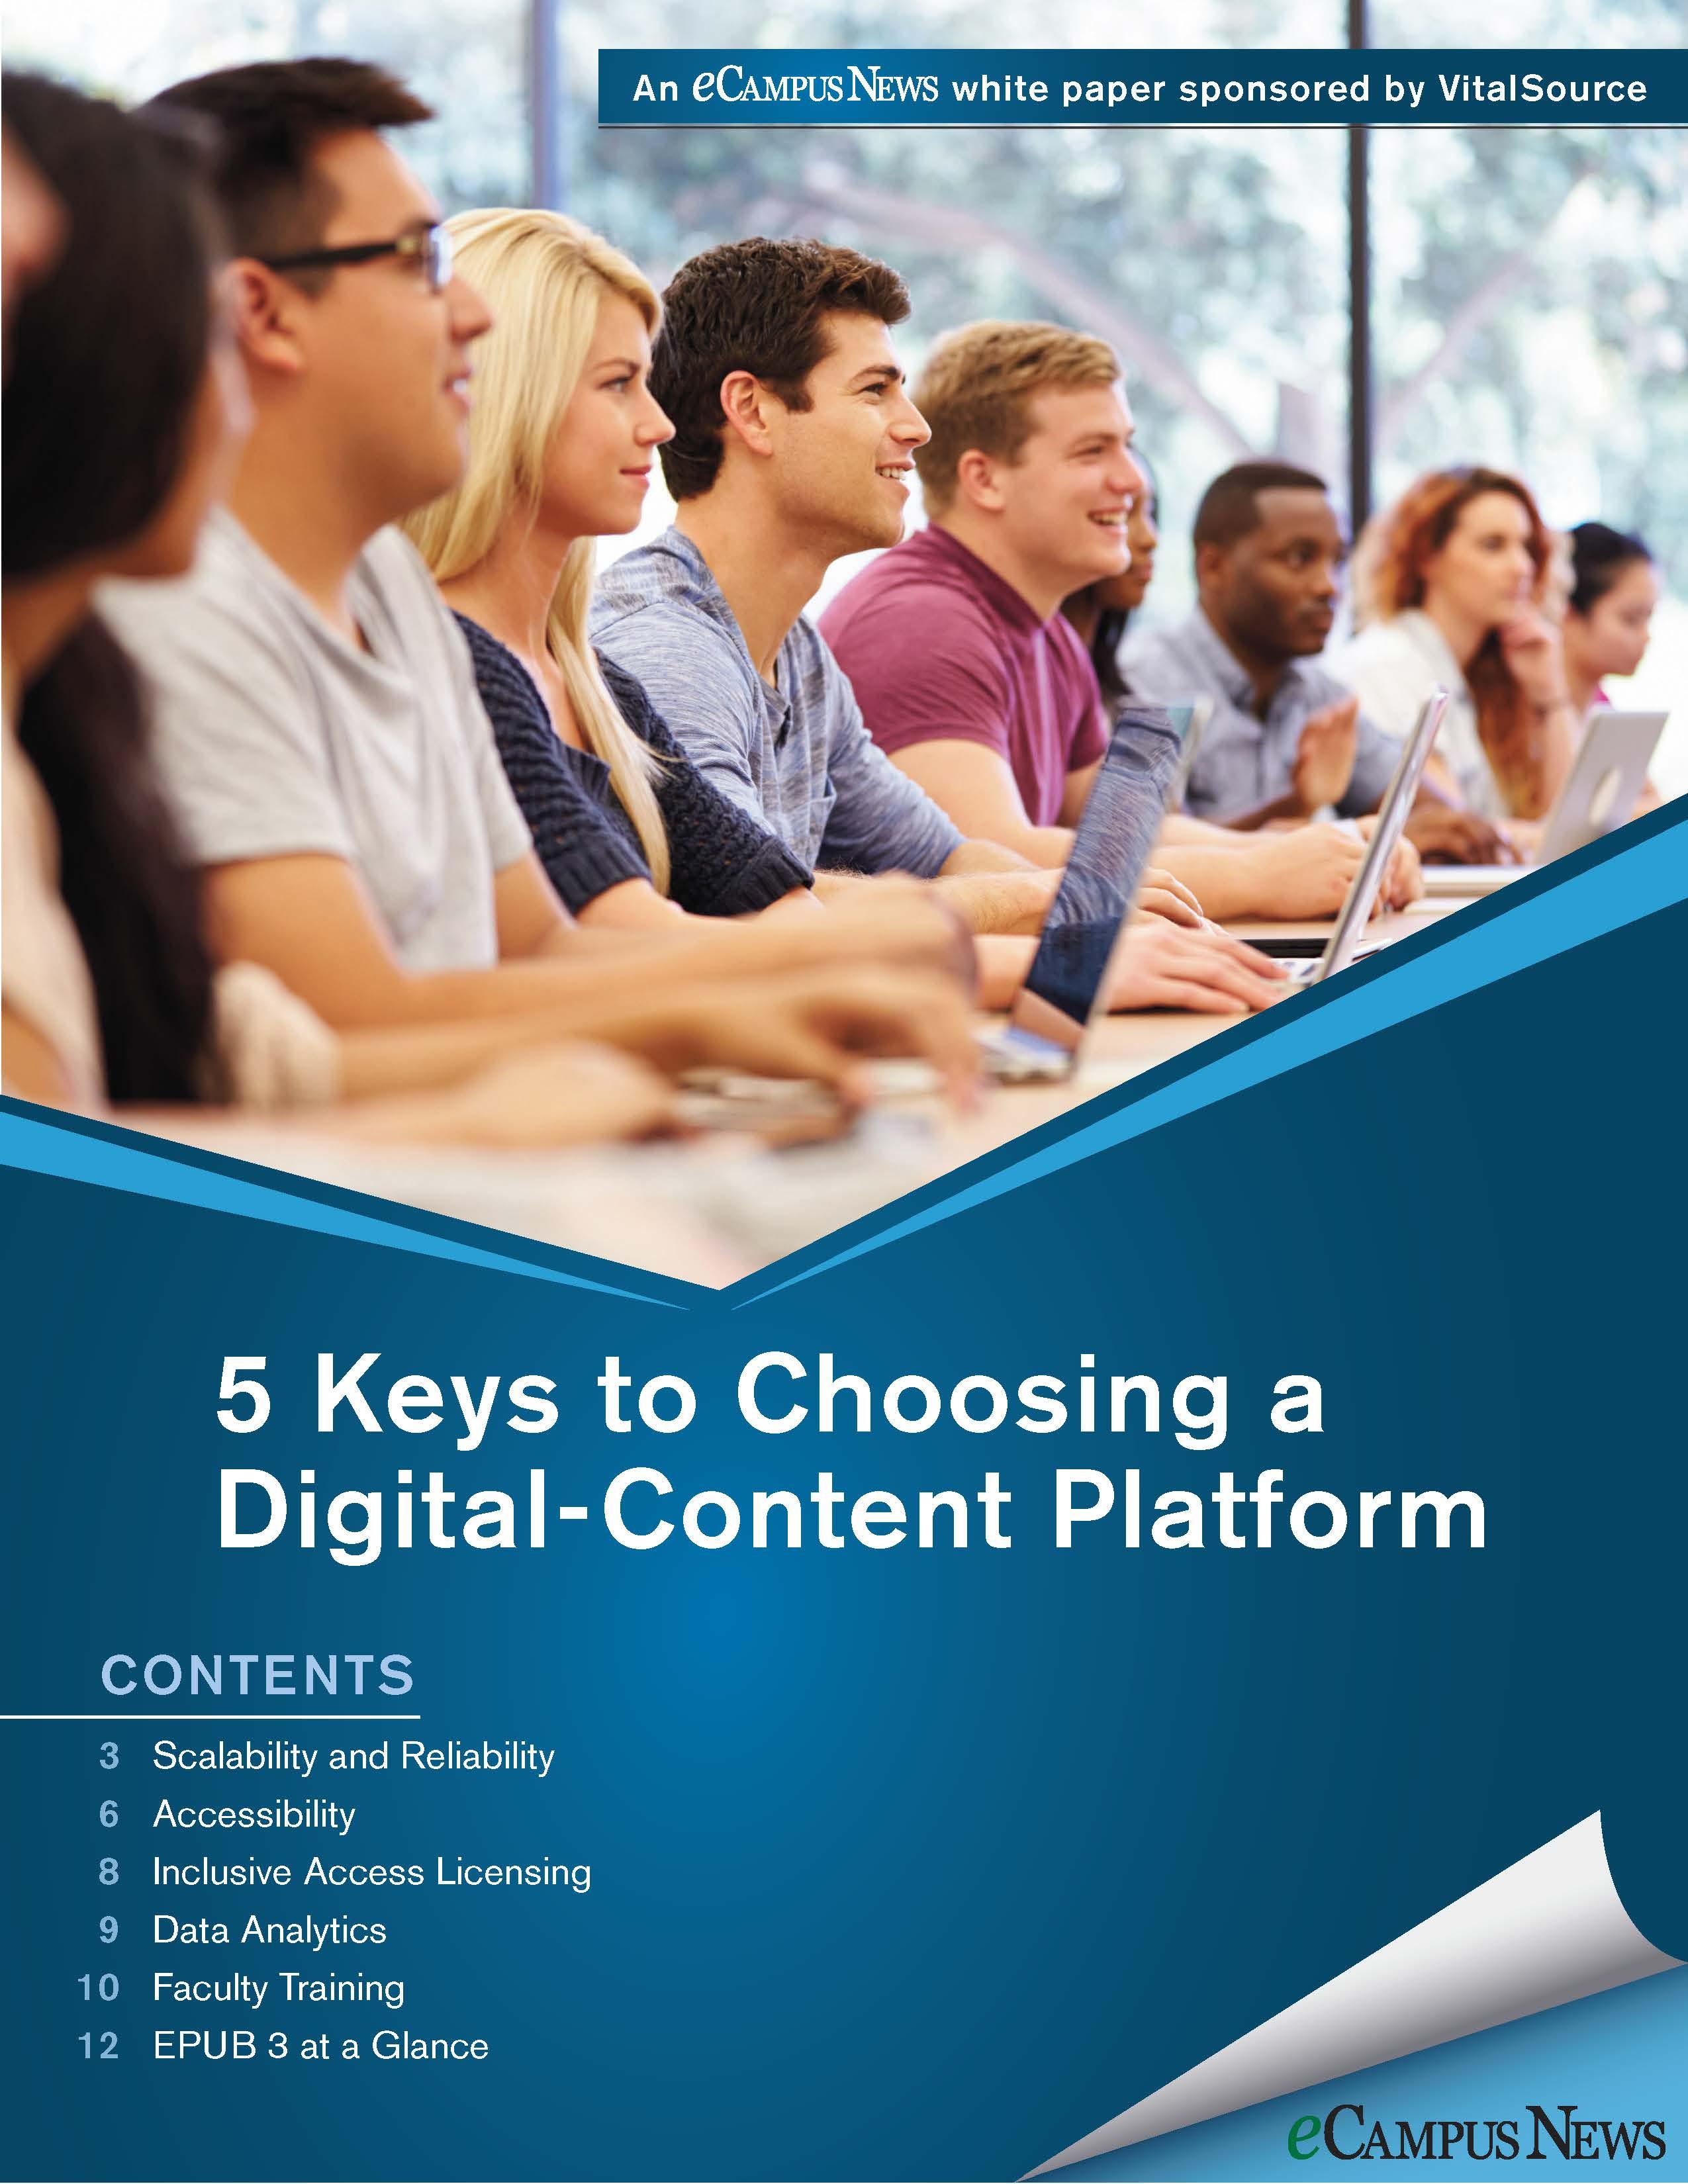 5 Keys to Choosing a Digital-Content Platform